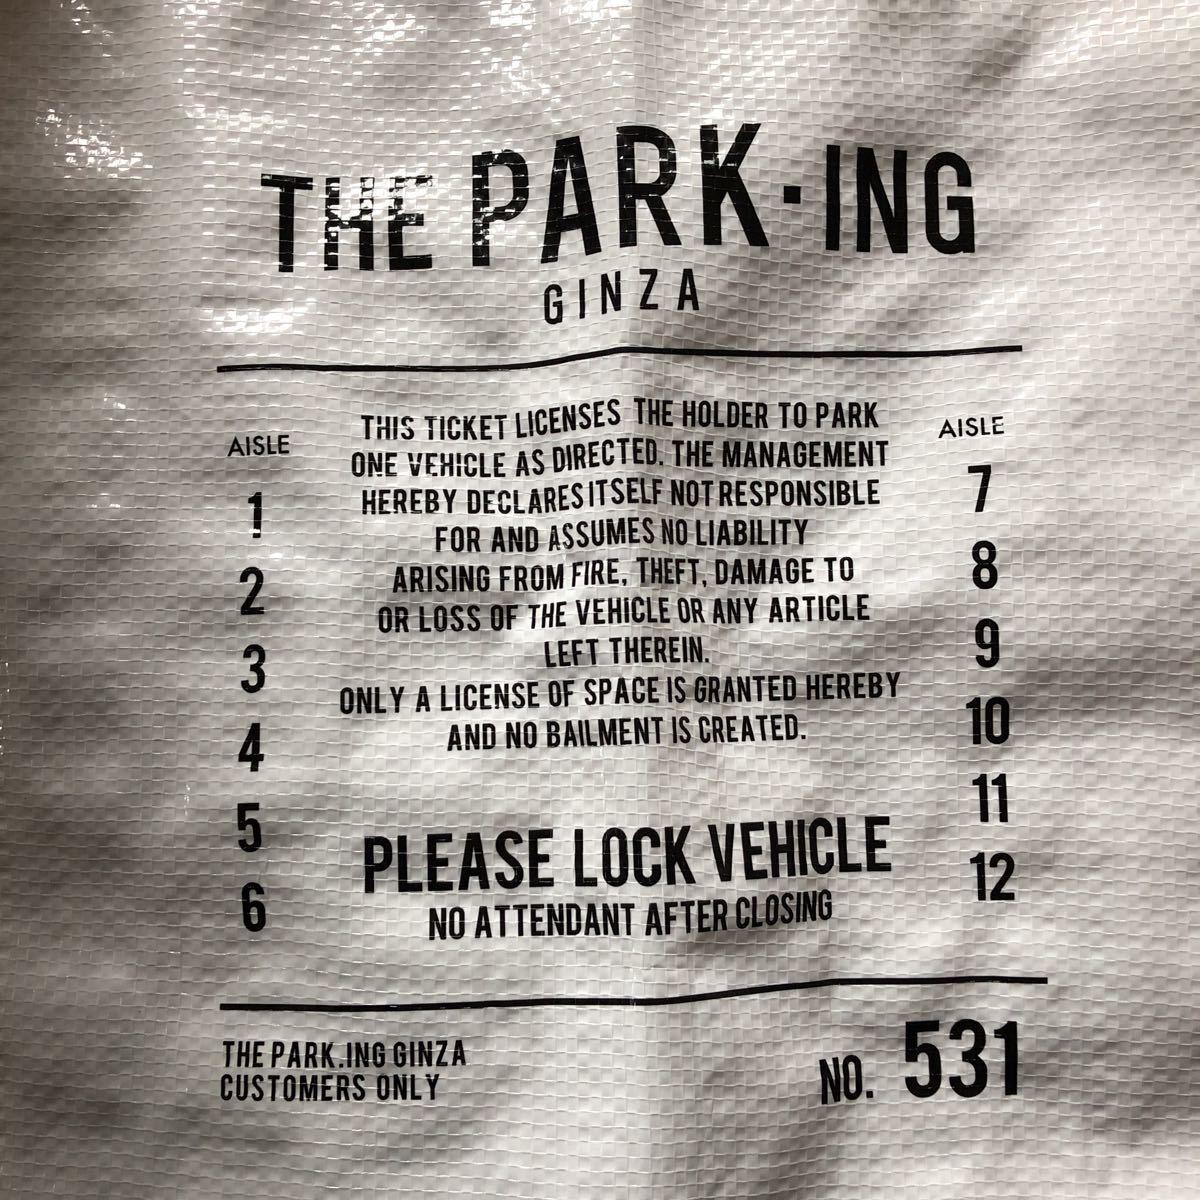 THE PARKING GINZA パーキング ギンザ トートバッグ 藤原ヒロシfragment_画像4